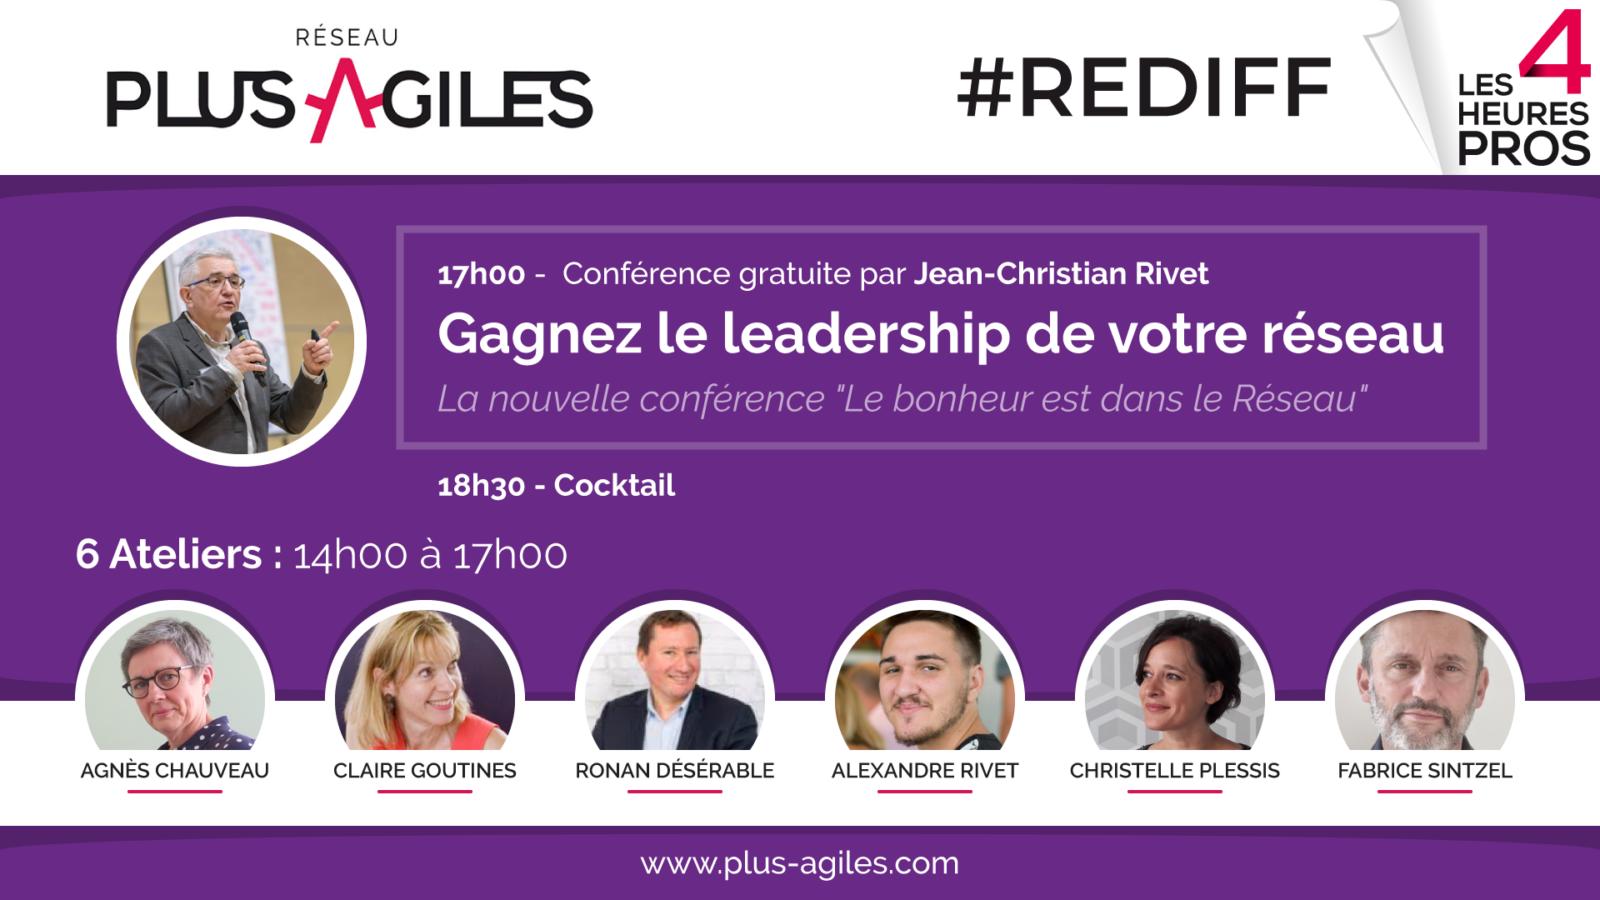 rediff 4h pro 202002 facebook event - #REDIFF : Les 4H Pros de mars 2020 à Niort Tech